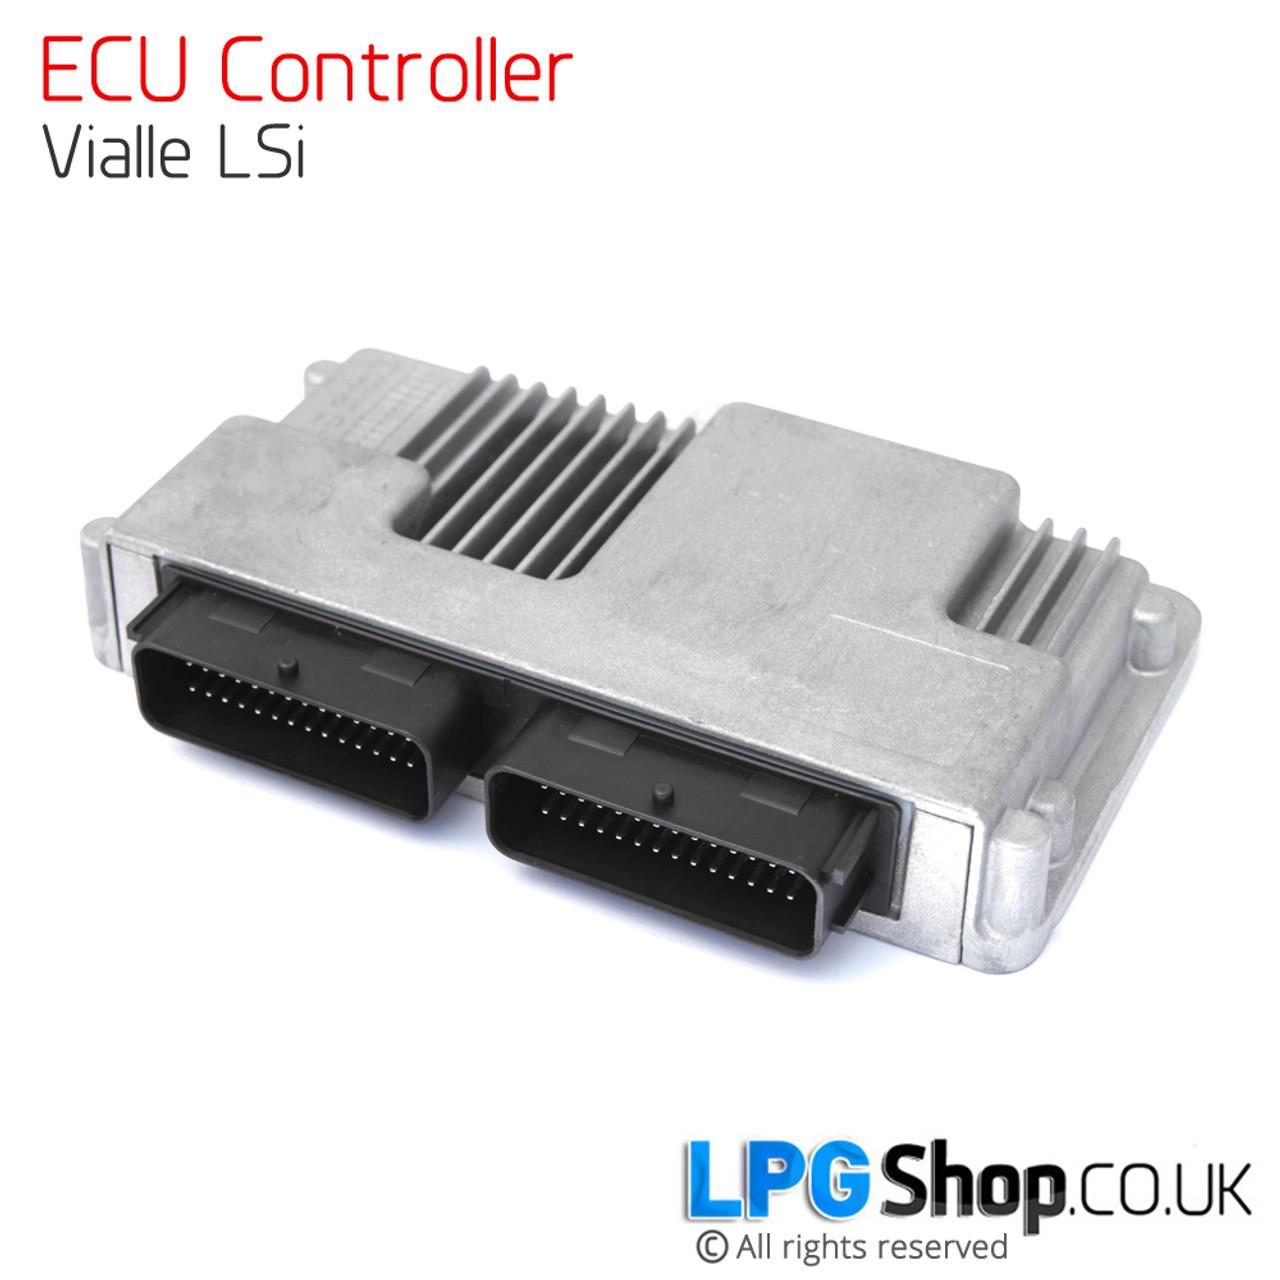 medium resolution of  vialle lsi ecu controller liquid lpg autogas sequential injection